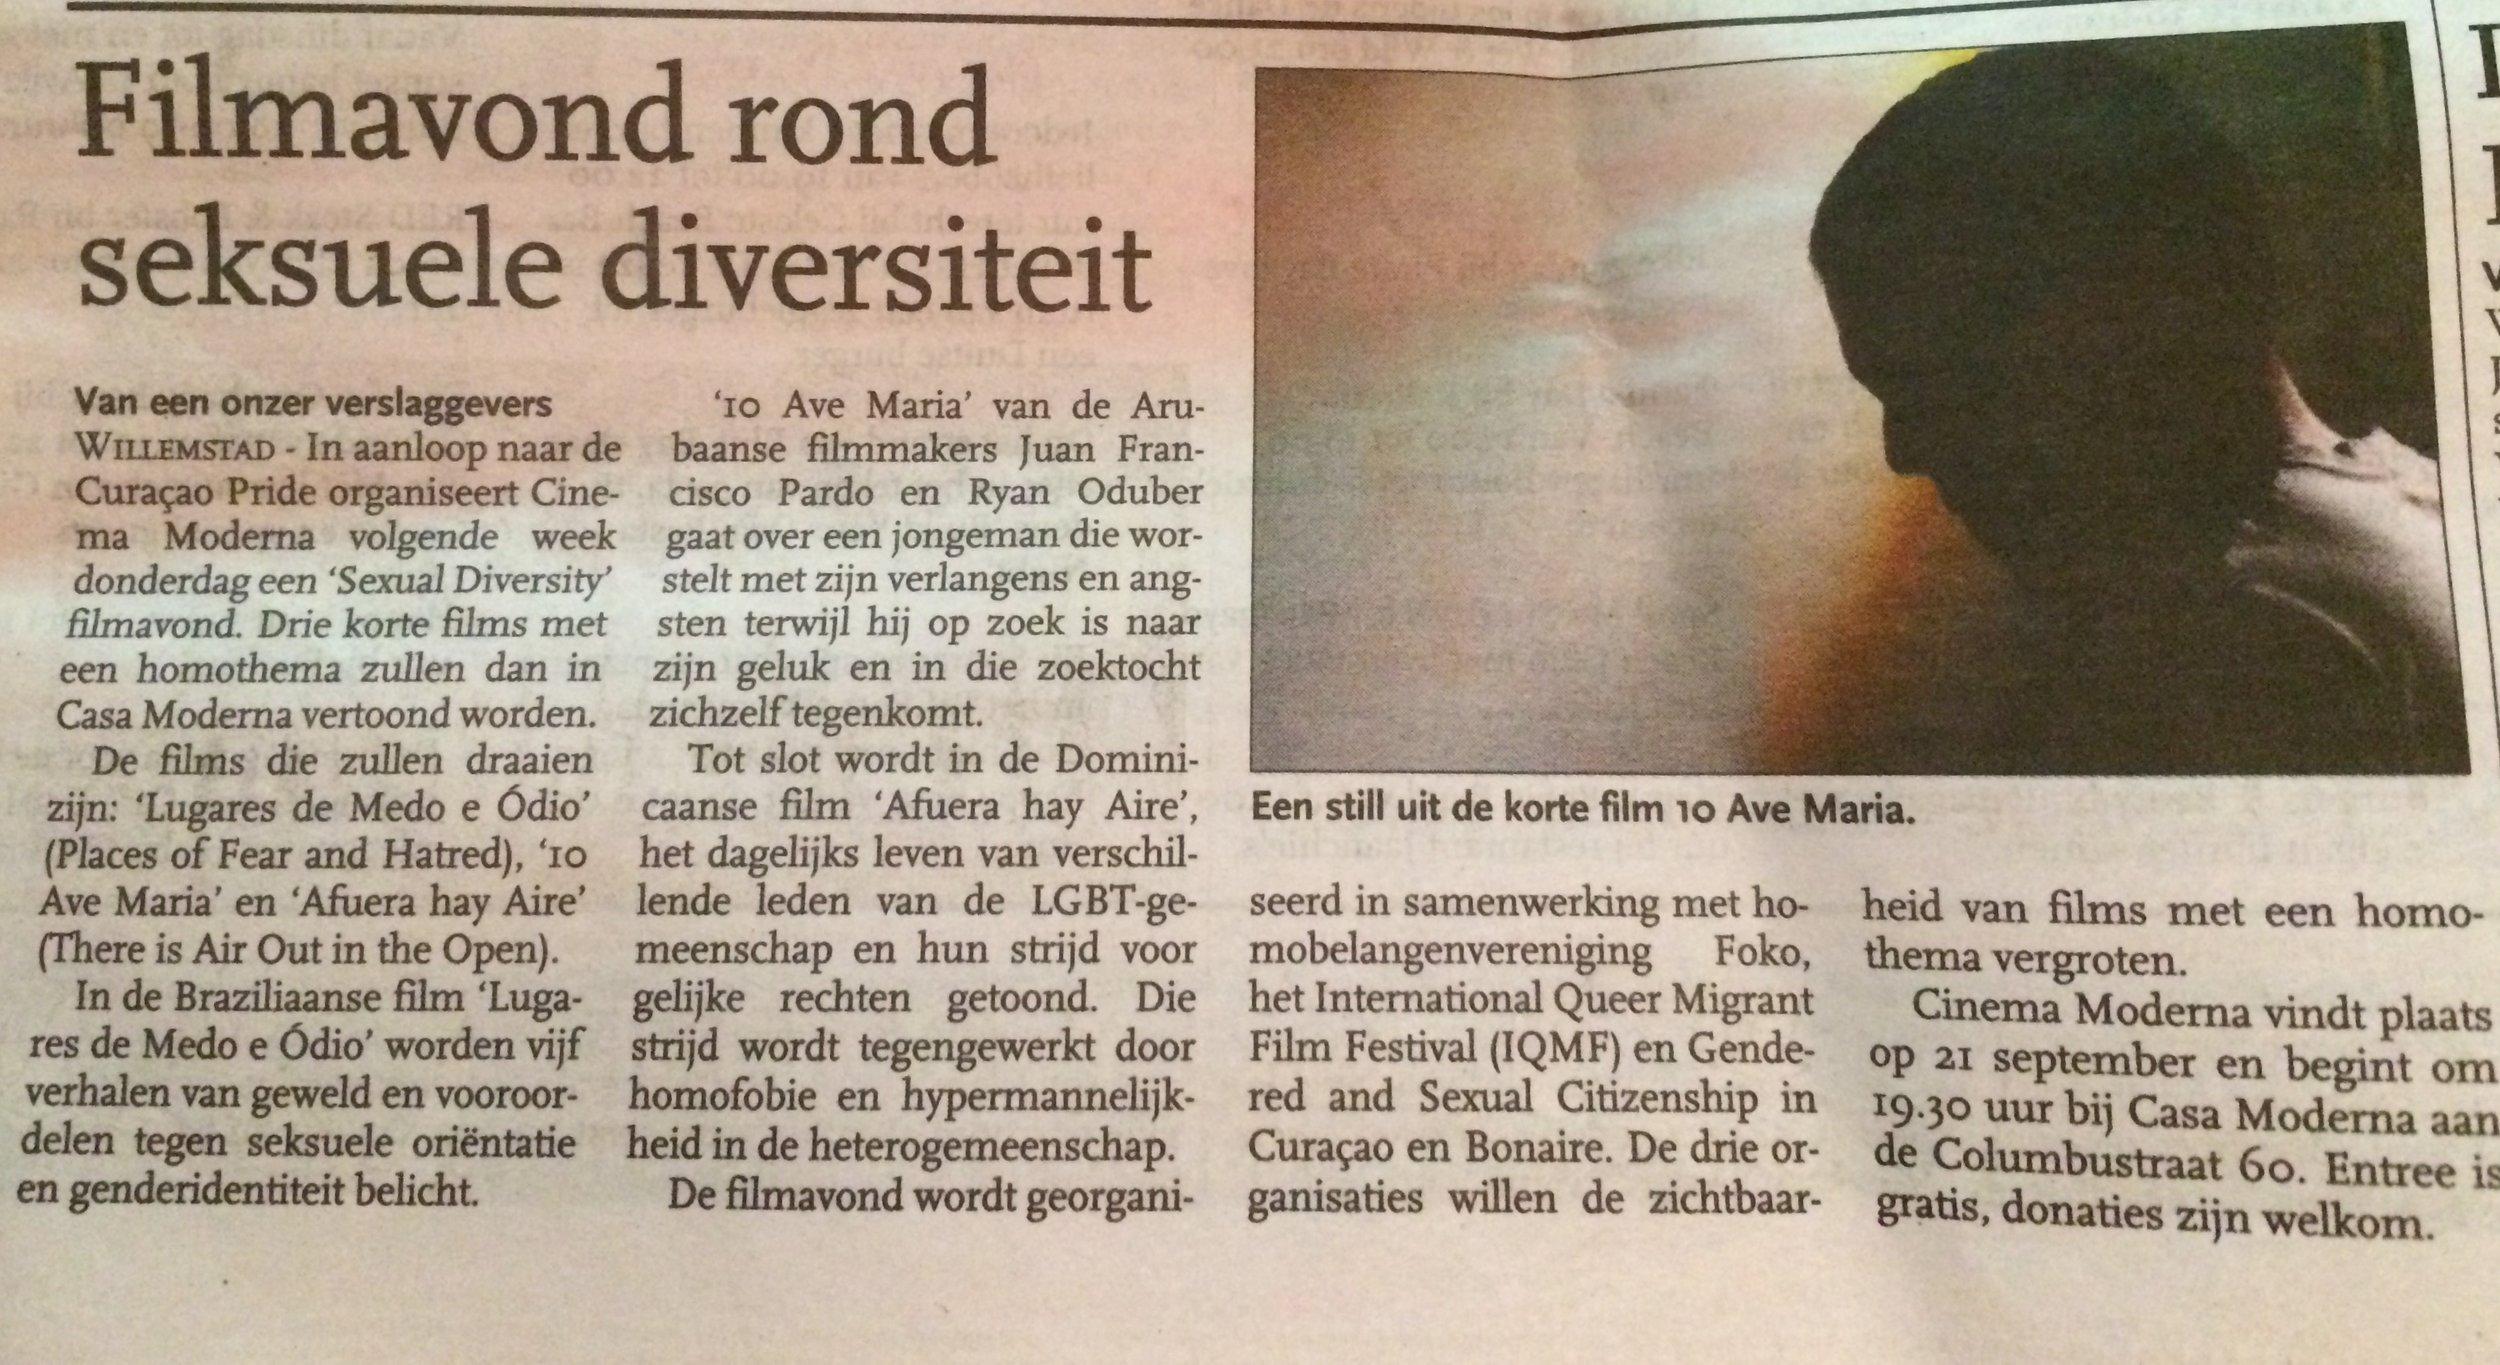 Article in Algemeen Dagblad - September 15, 2017